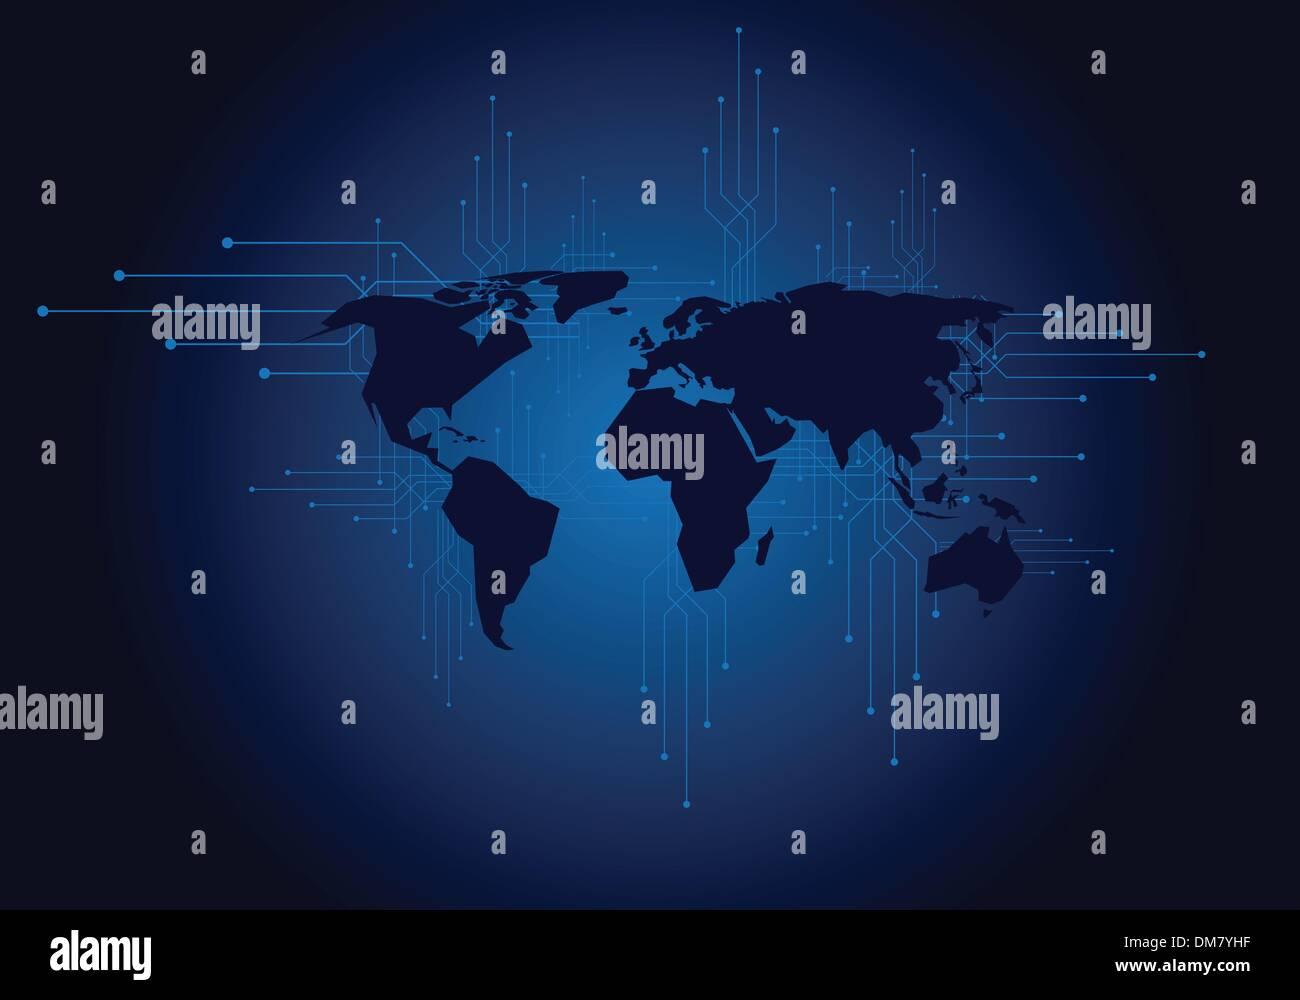 World map - Stock Image